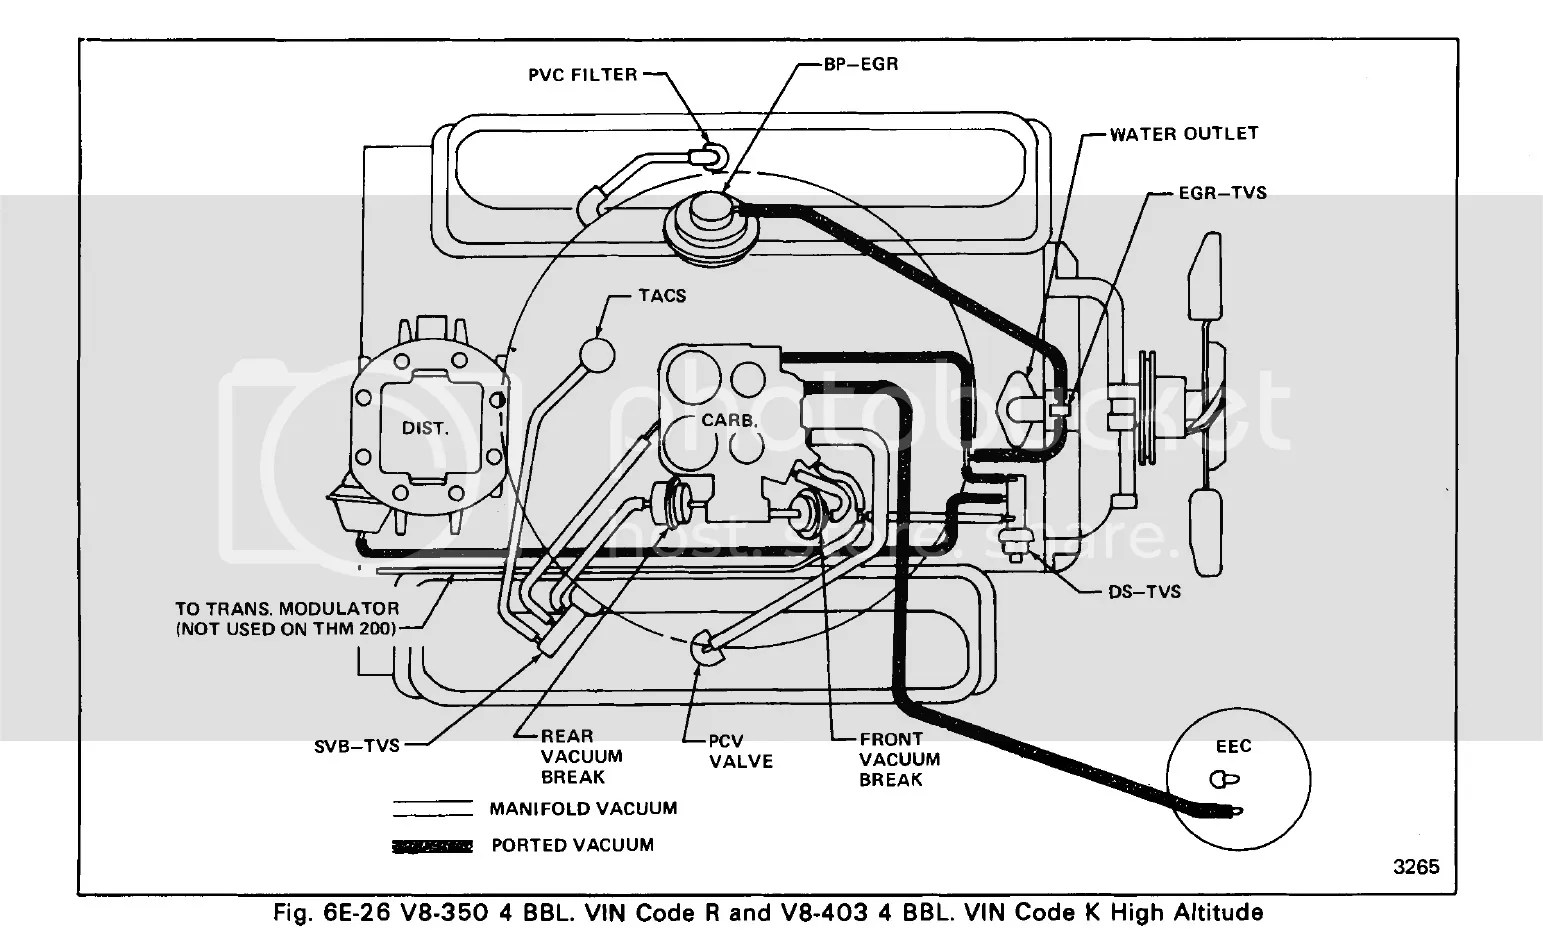 hight resolution of 1978 pontiac 403 engine diagram wiring diagram blog 1978 pontiac 403 engine diagram